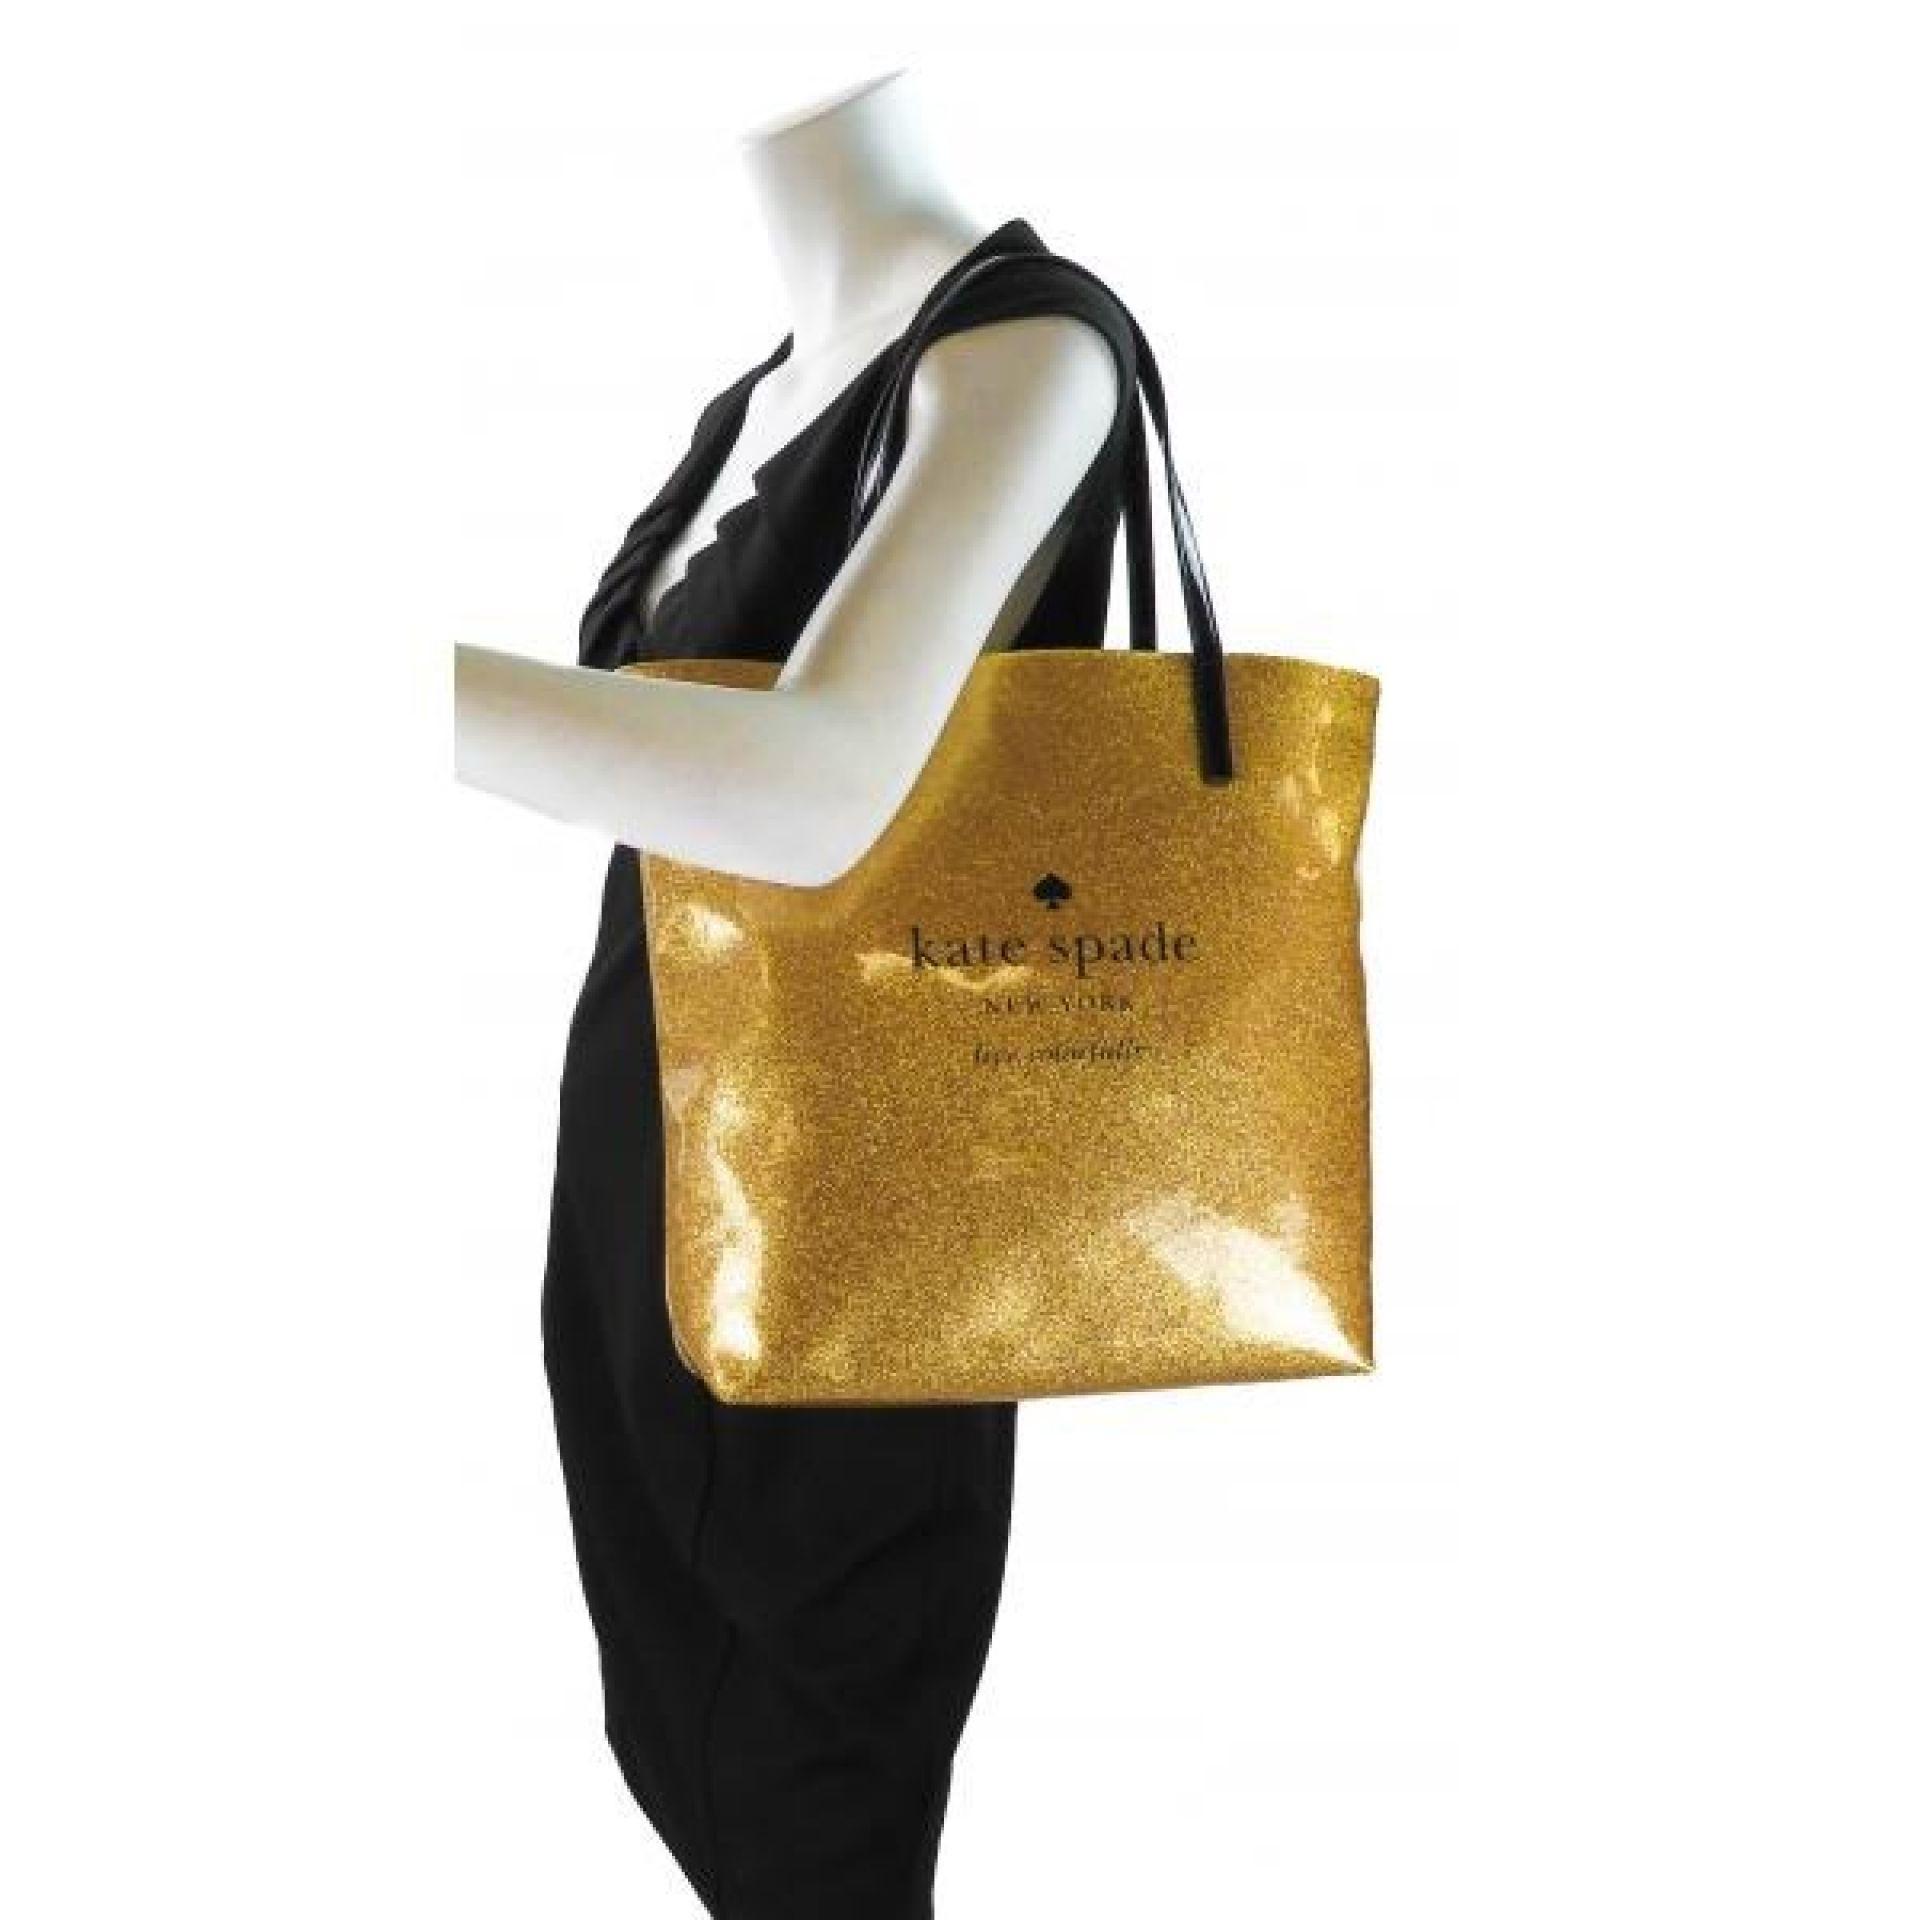 Kate Spade Gold Glitter PVC Holiday Drive Bon Shopper Tote Bag